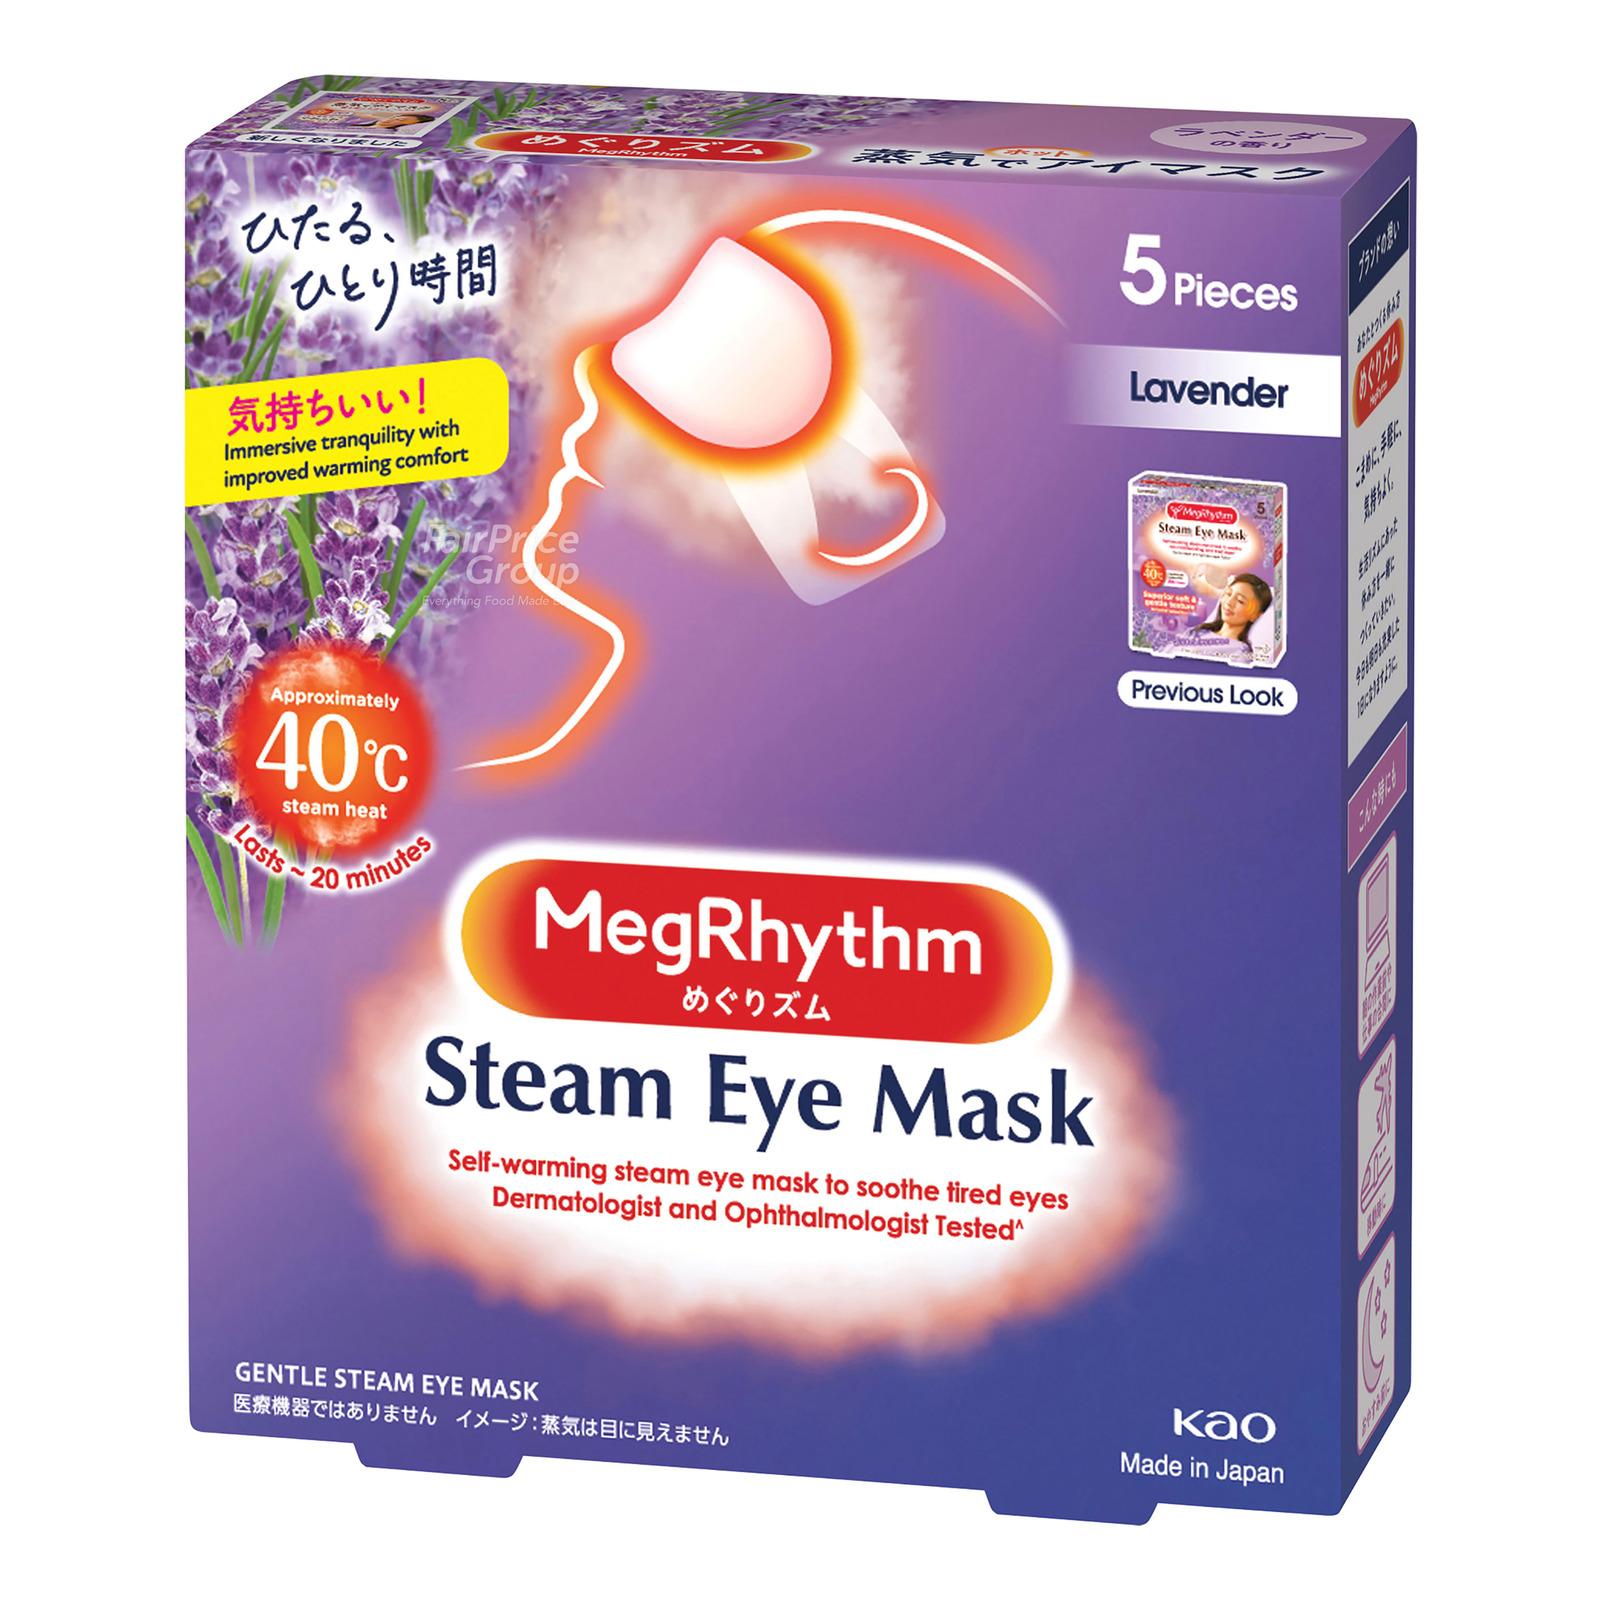 Megrhythm Steam Eye Mask - Lavender-Sage Scent